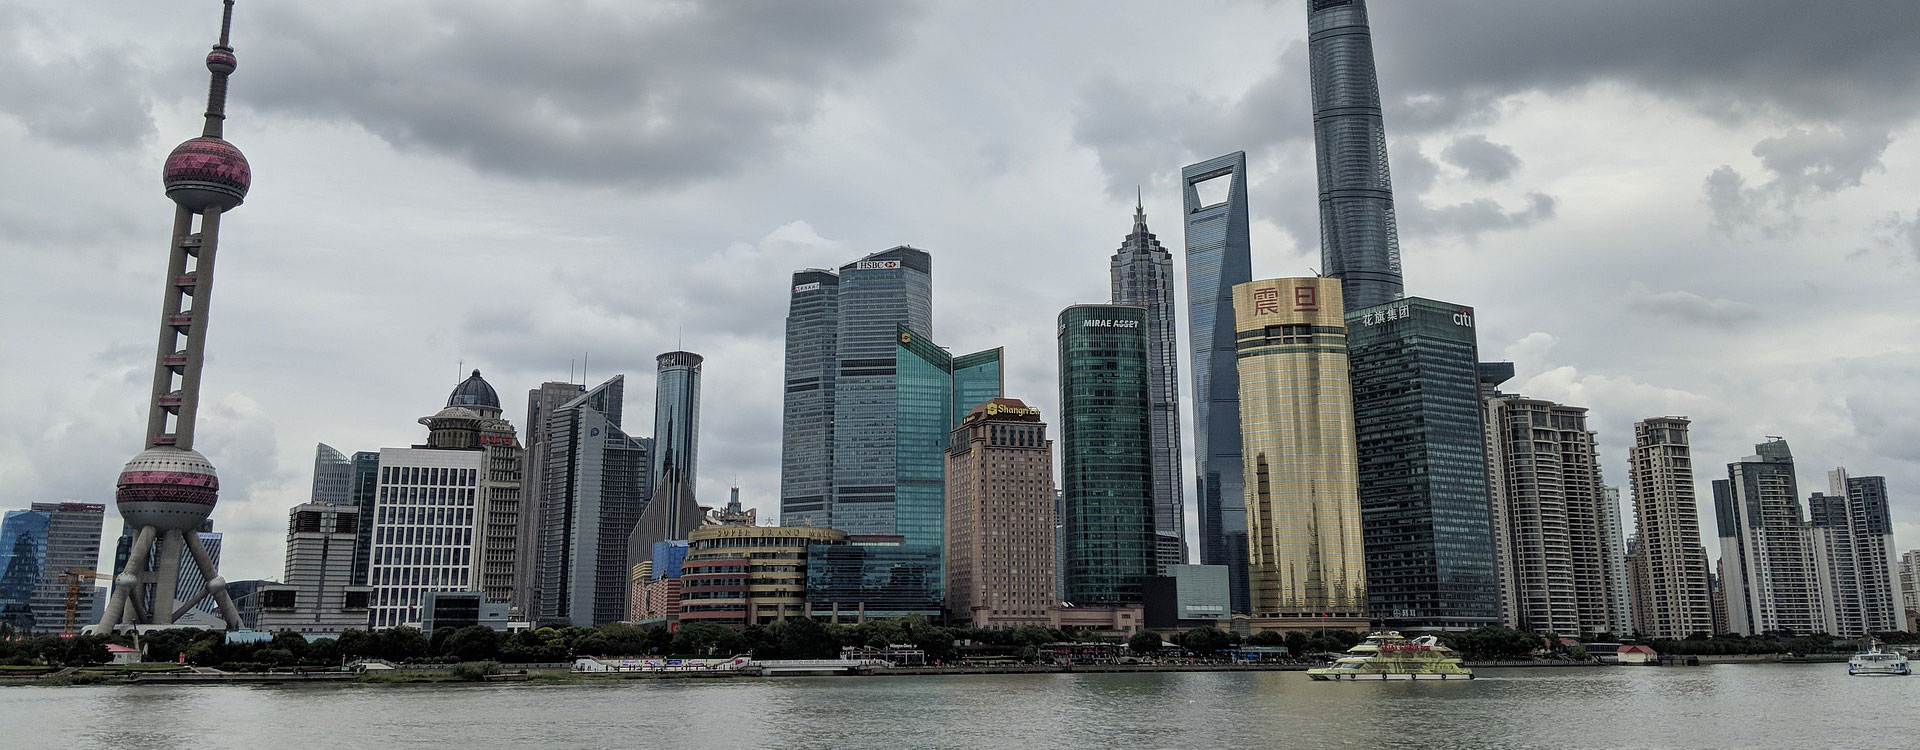 China: Bussiness